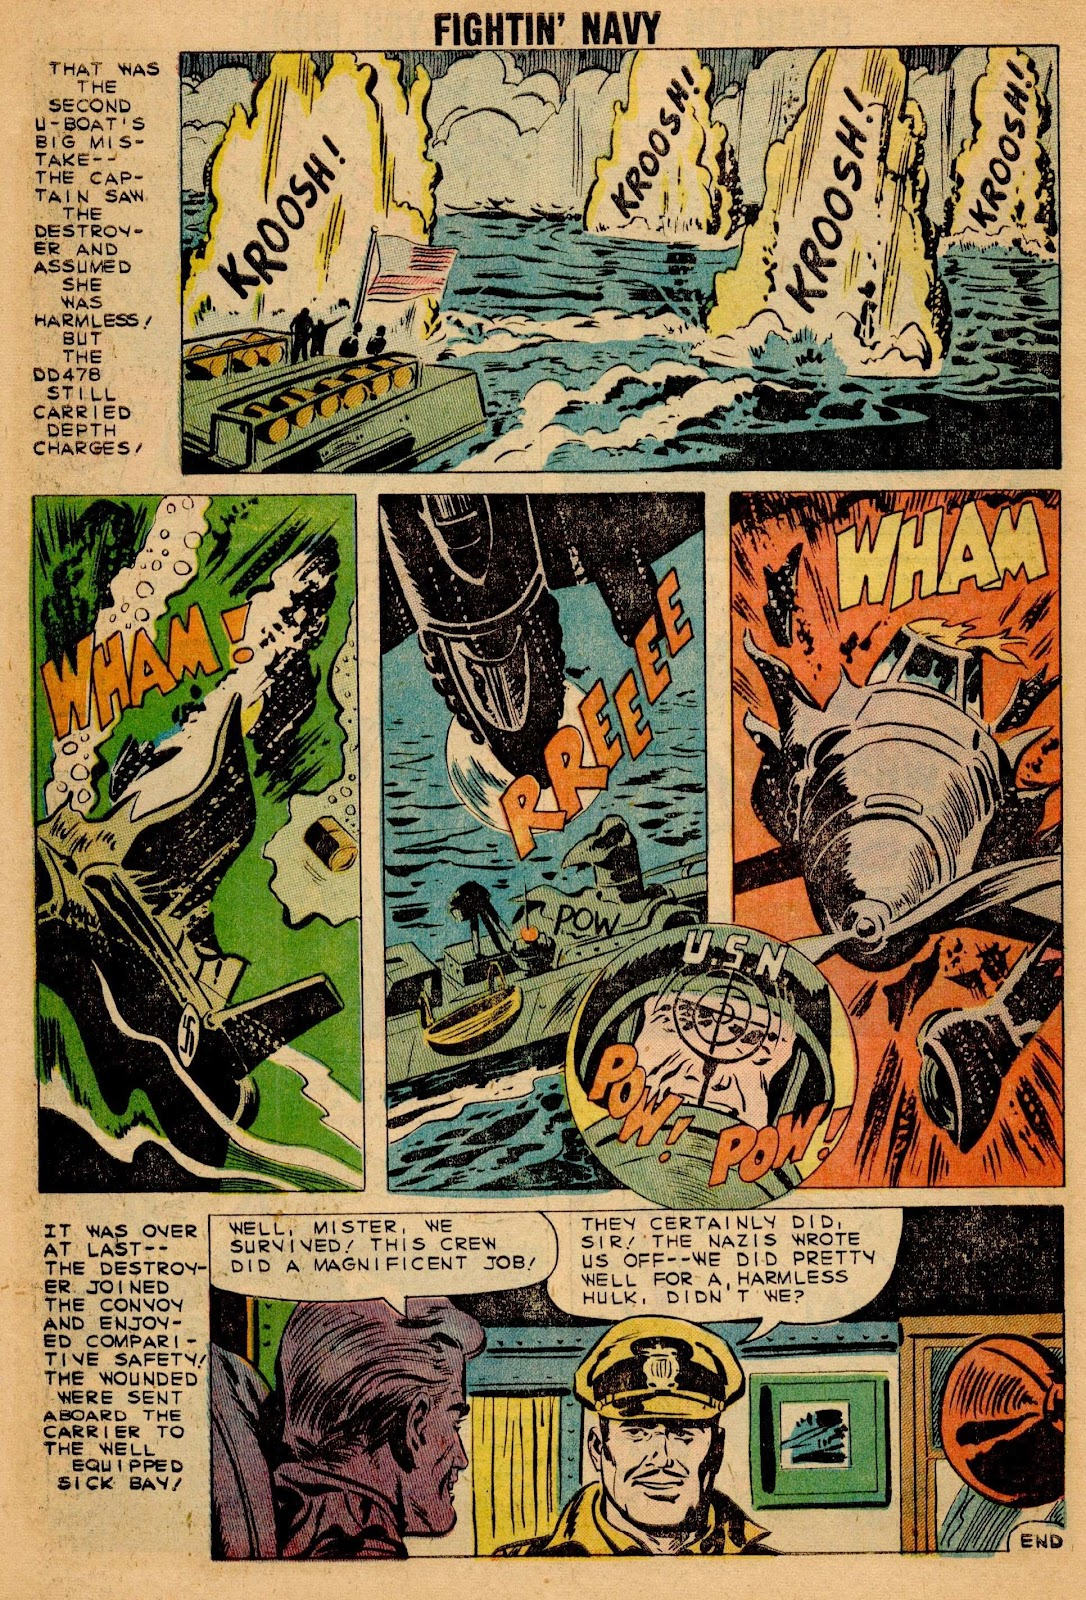 Read online Fightin' Navy comic -  Issue #90 - 10